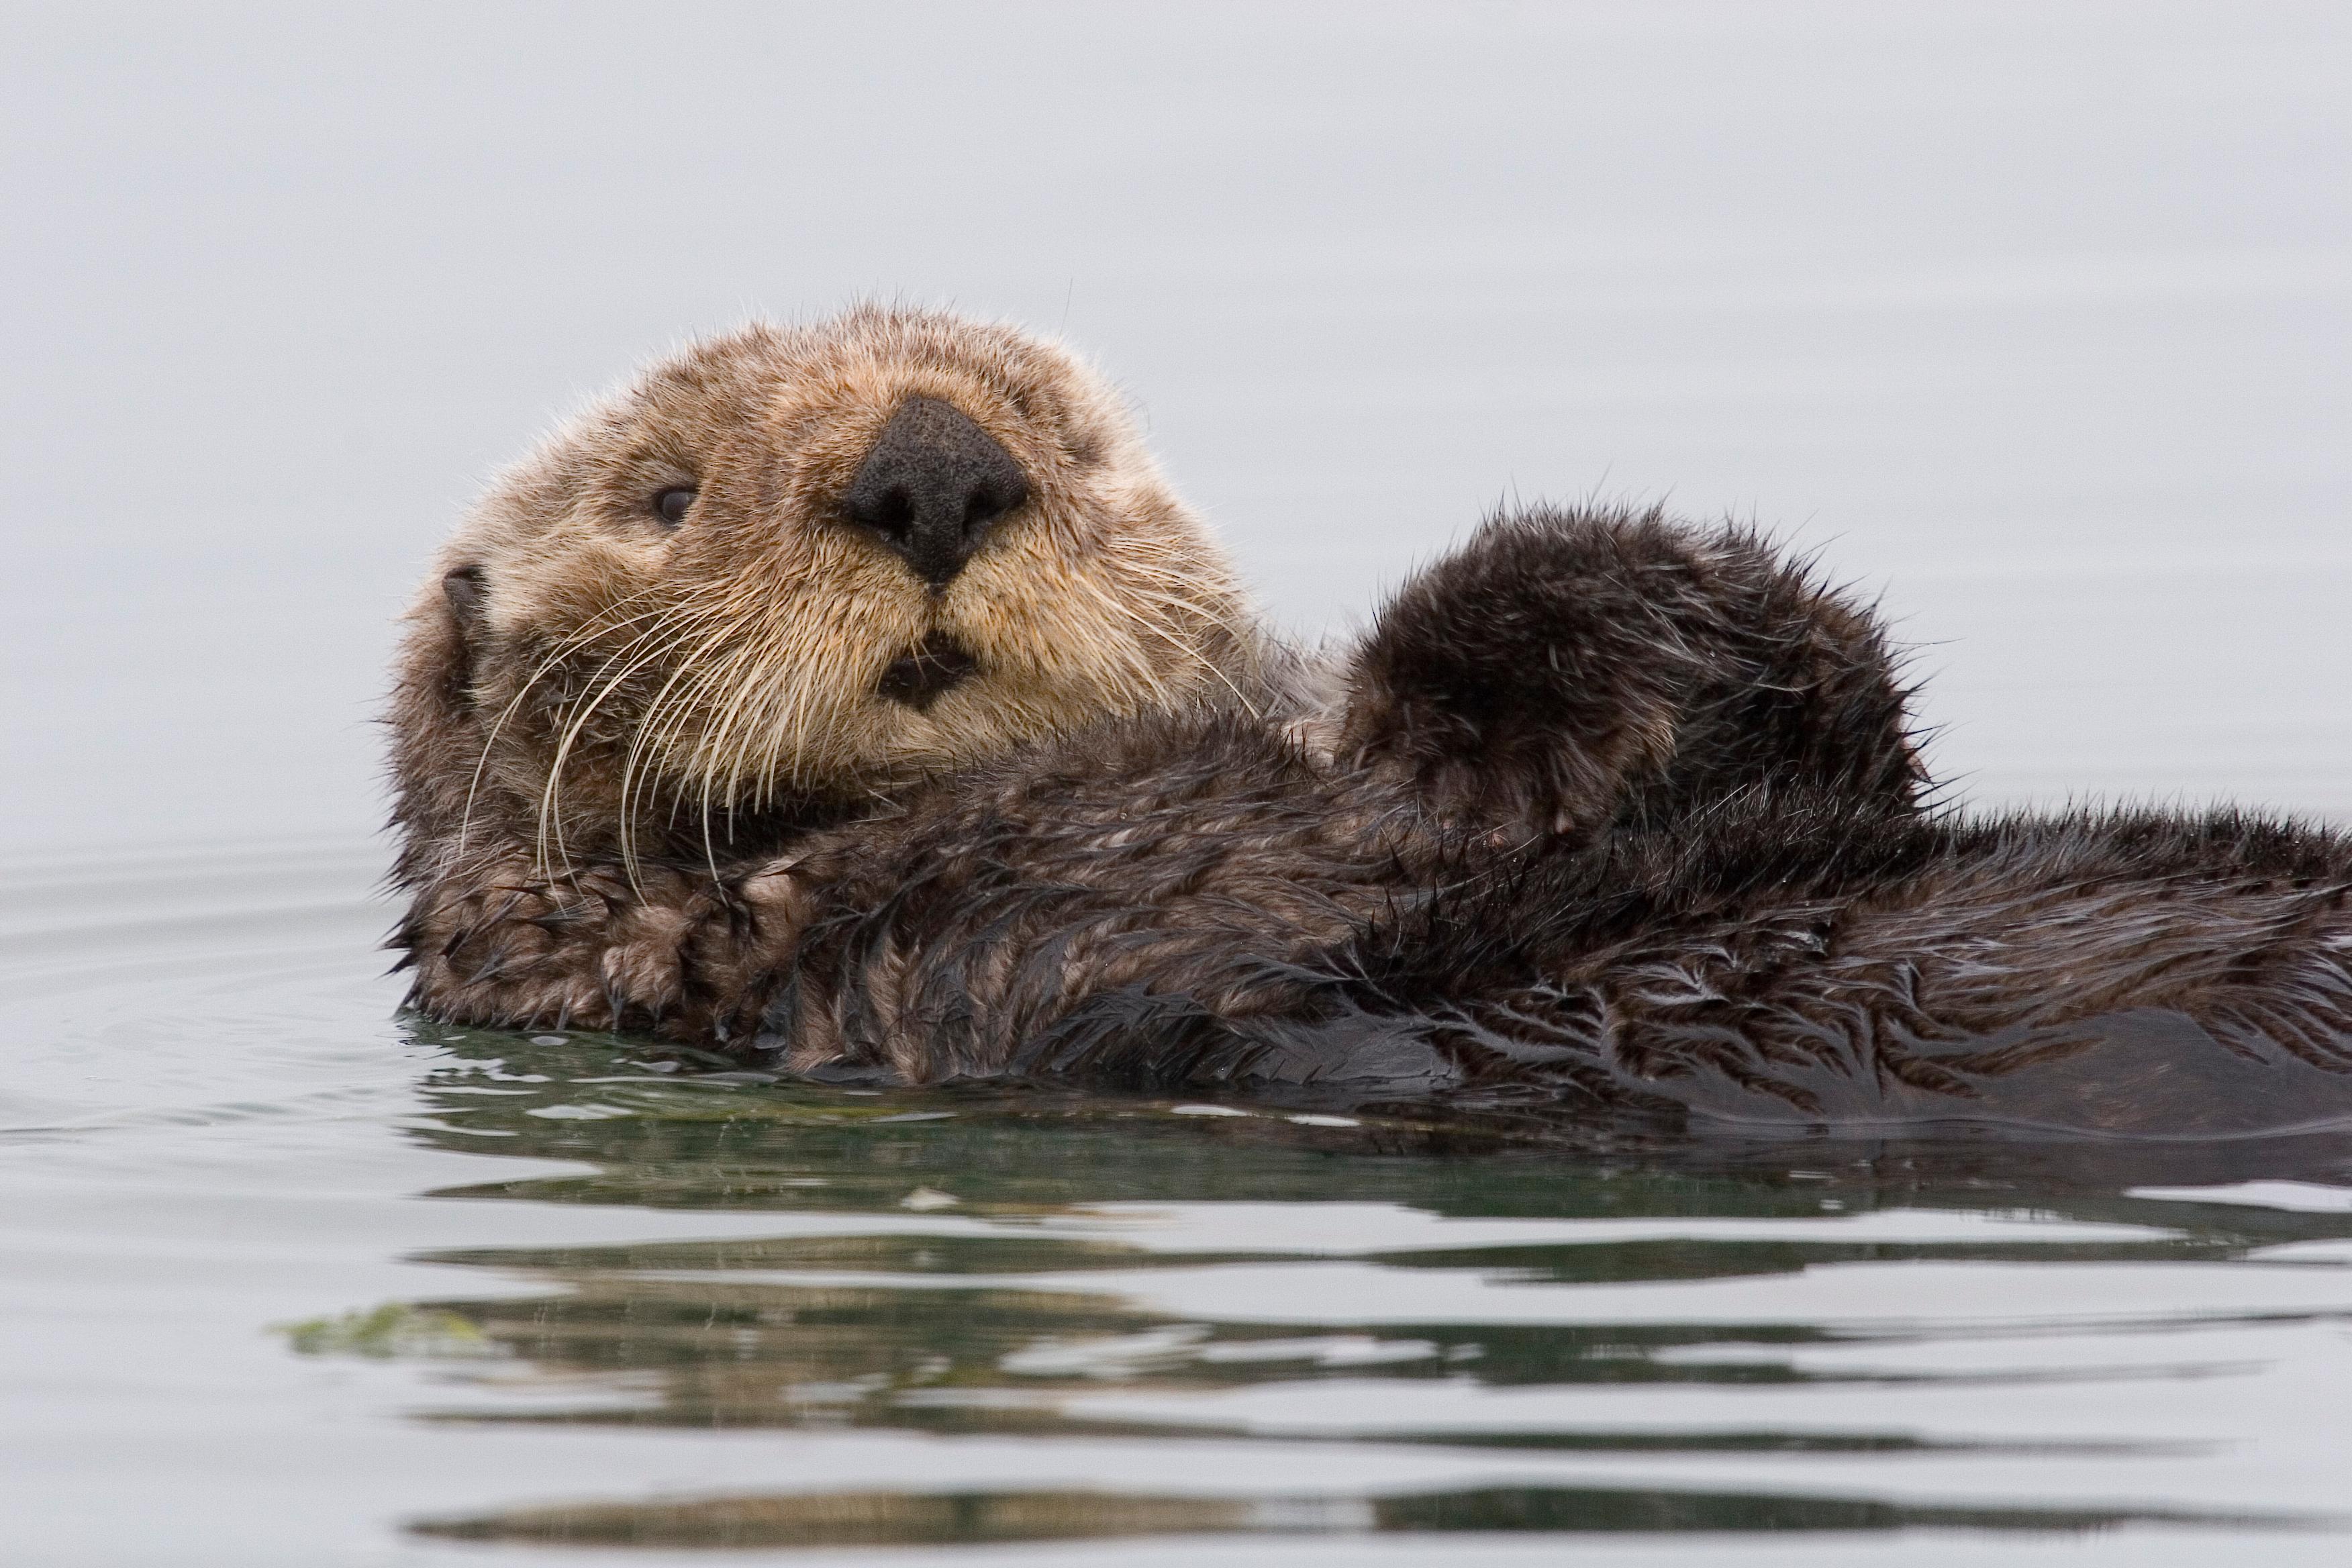 File:Sea-otter-morro-bay 13.jpg - Wikipedia